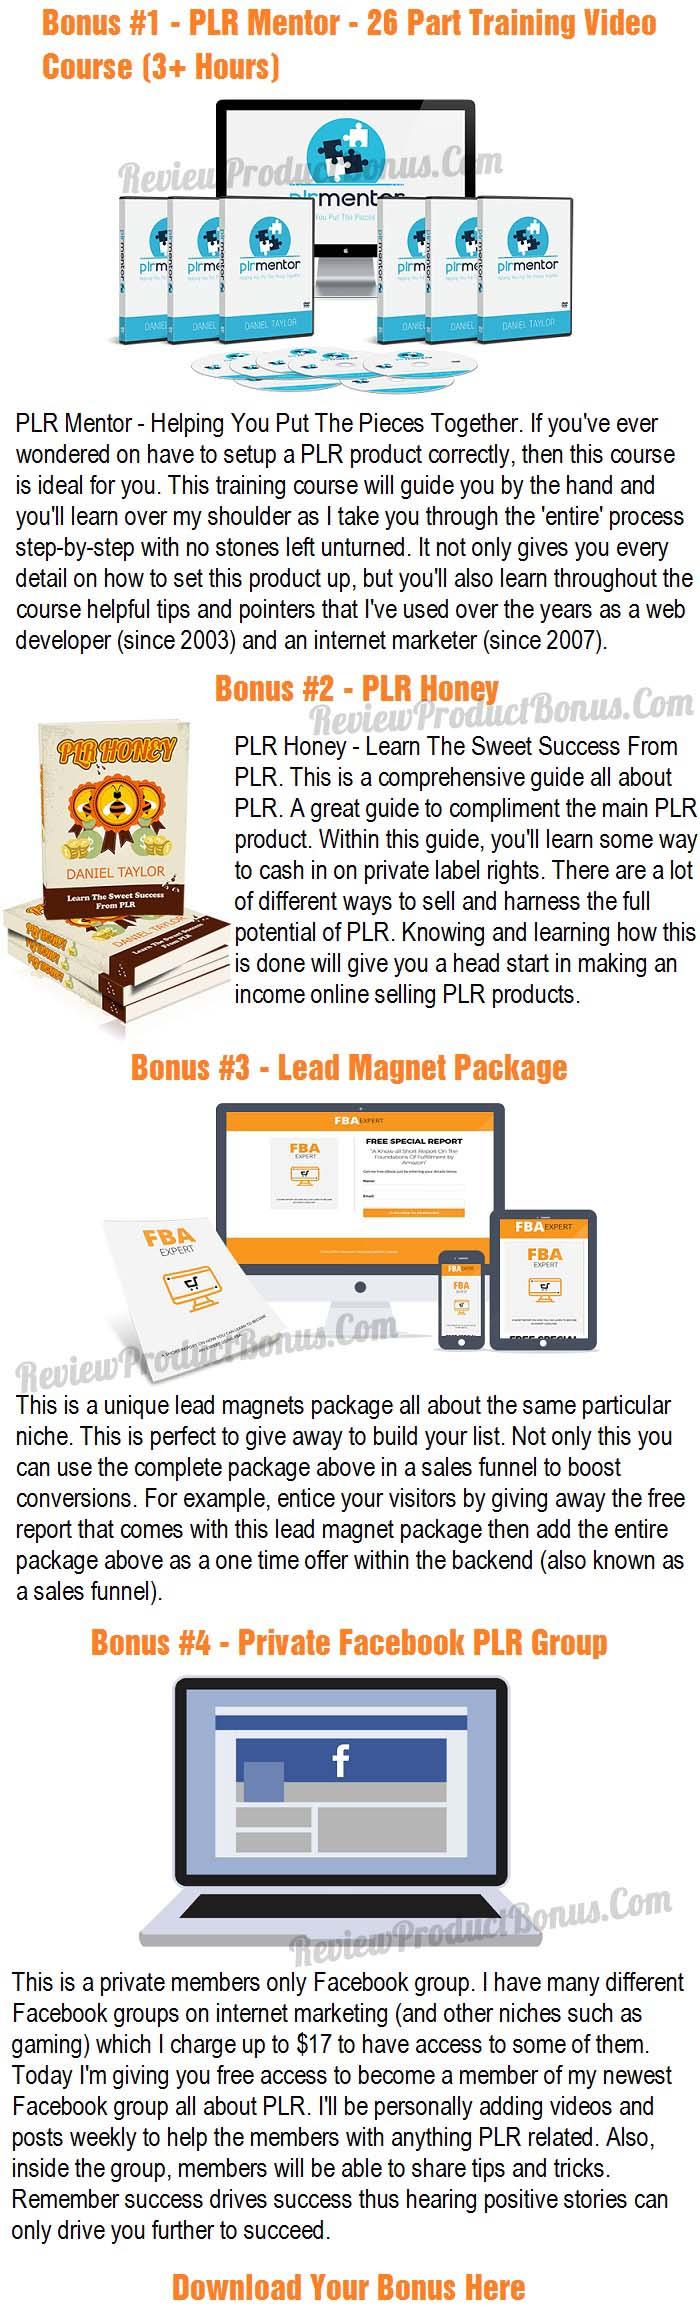 PLR Fulfillment By Amazon Bonus